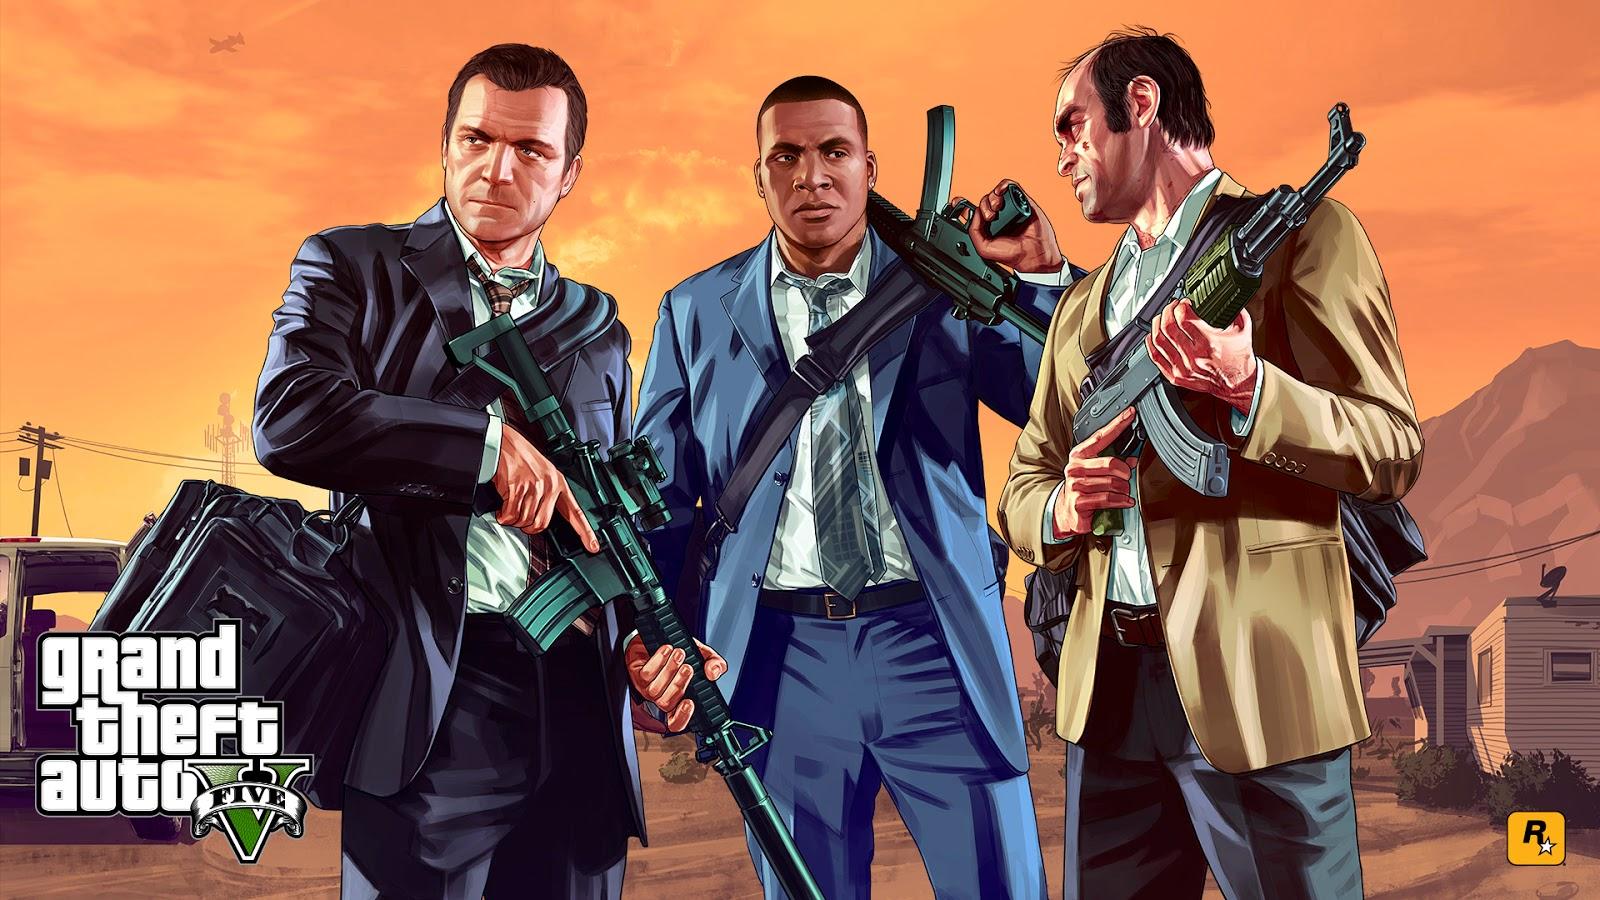 Grand Theft Auto V Wallpaper FULL HD